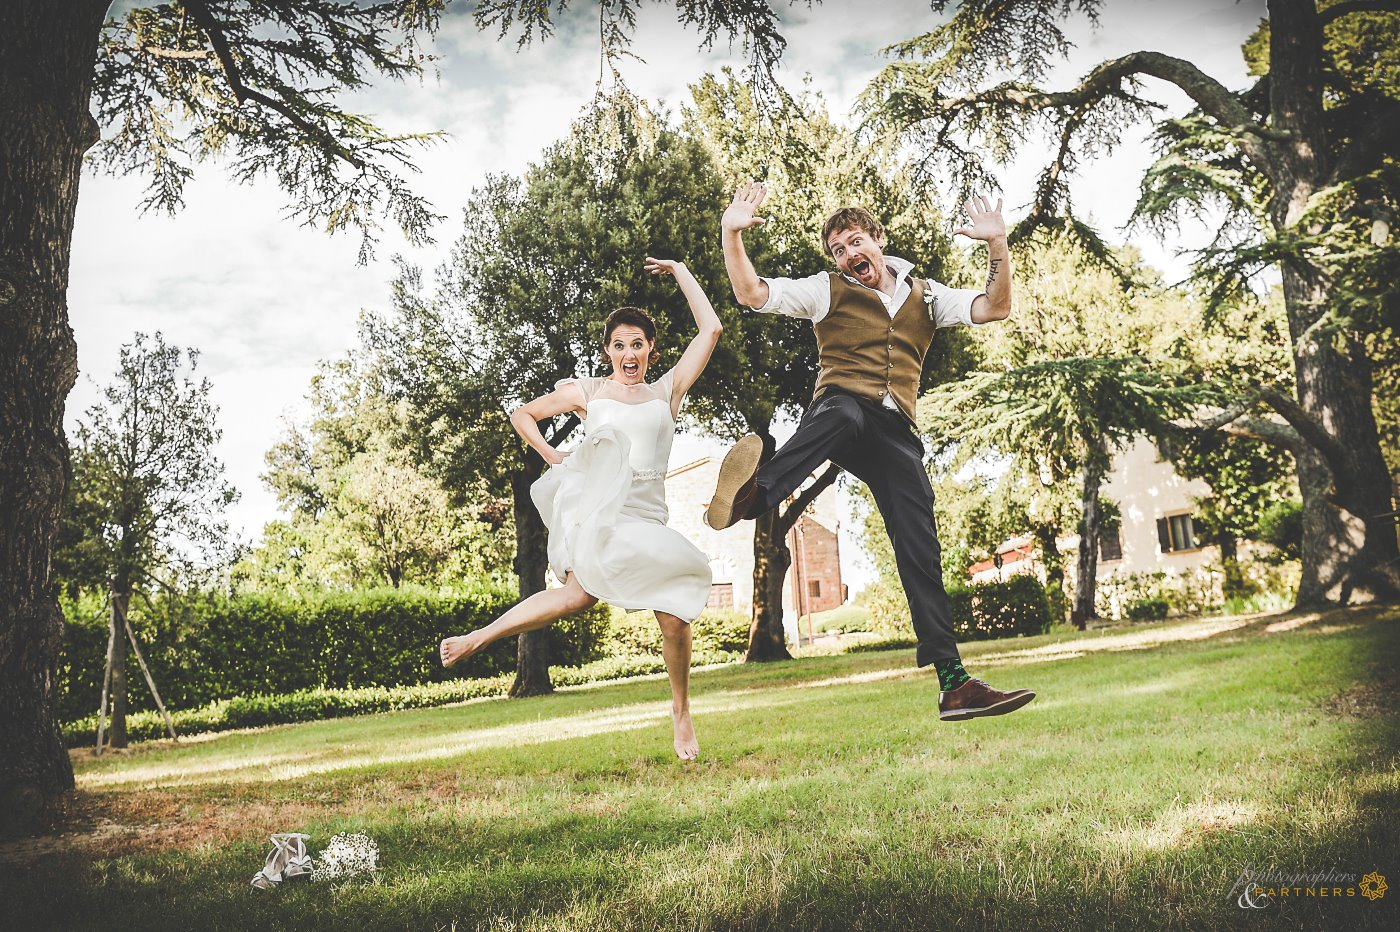 photo_weddings_castelfalfi_11.jpg